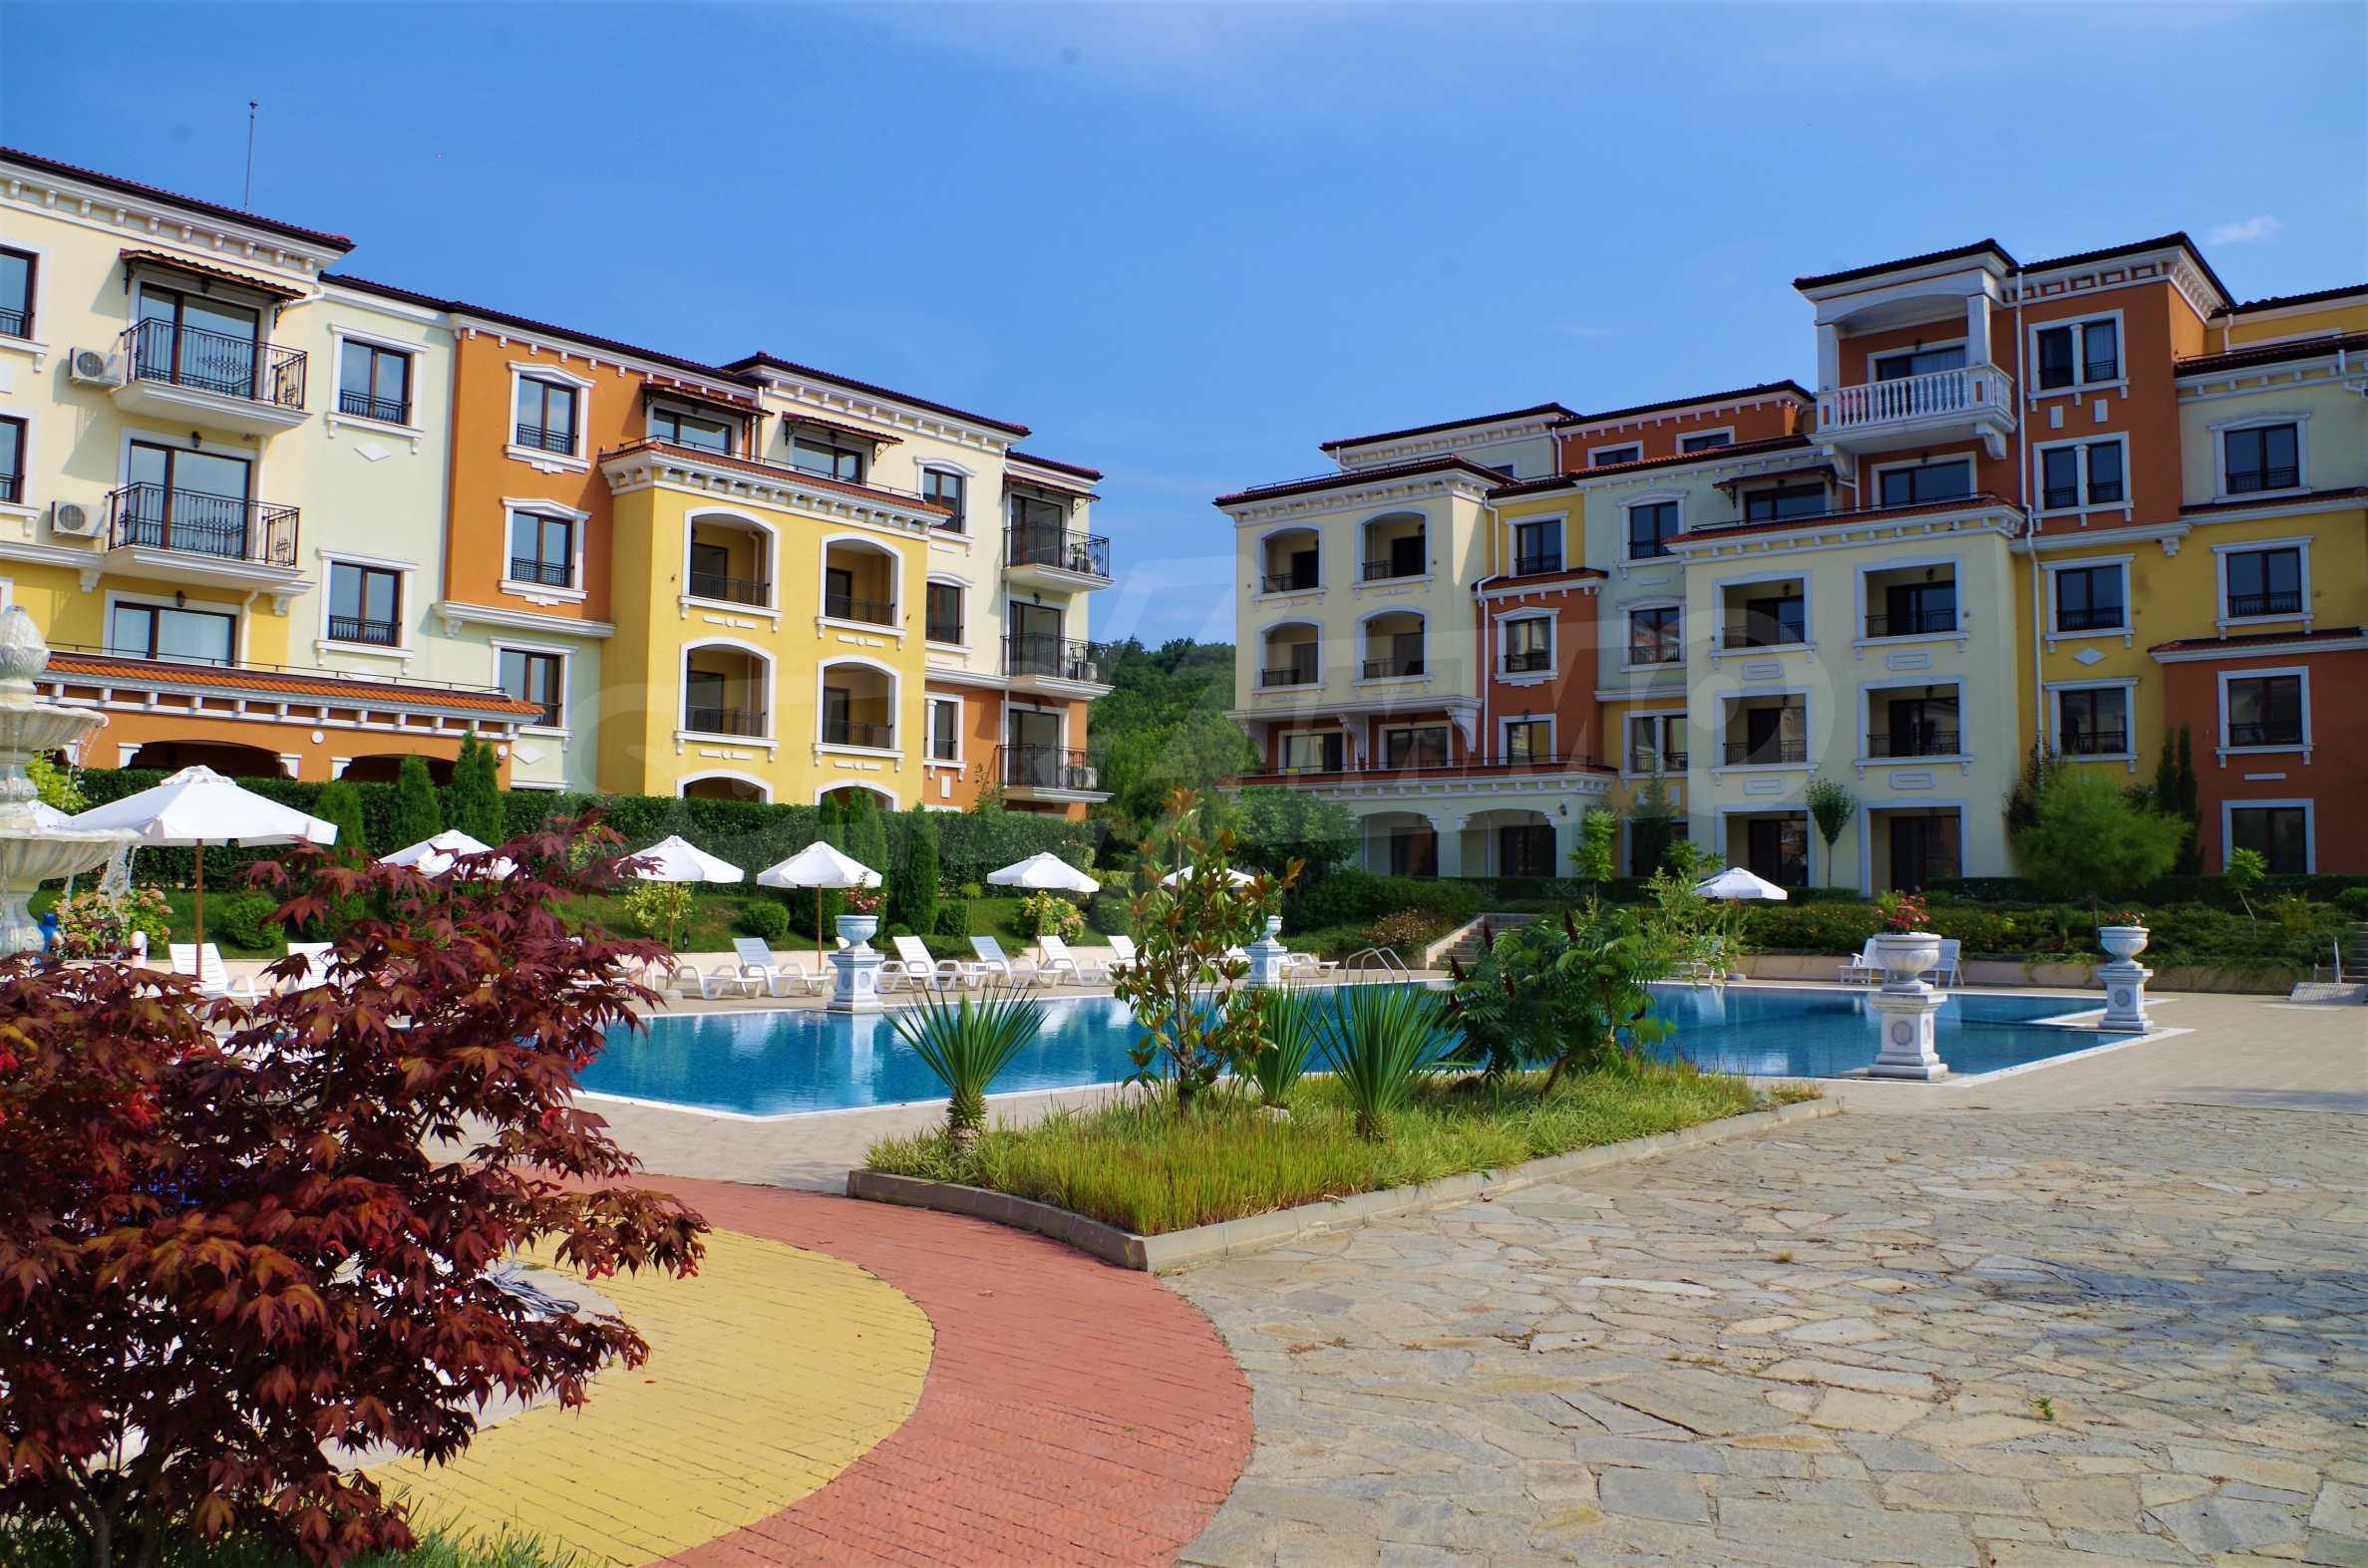 Lily Beach - splendid, built in Italian style complex near Kavatsi beach (Sozopol) 1